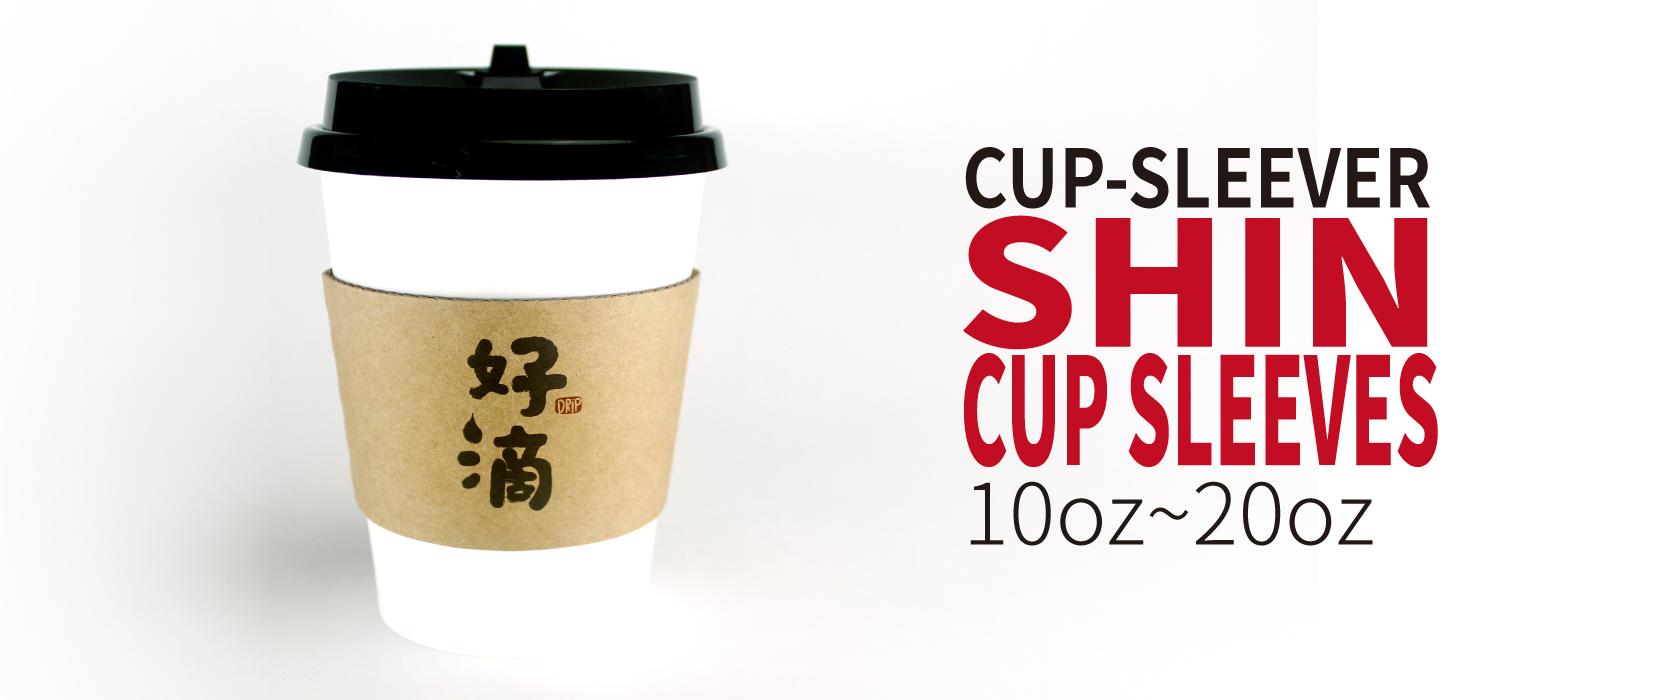 SHIN版隔熱杯套 - CUP-SLEEVER